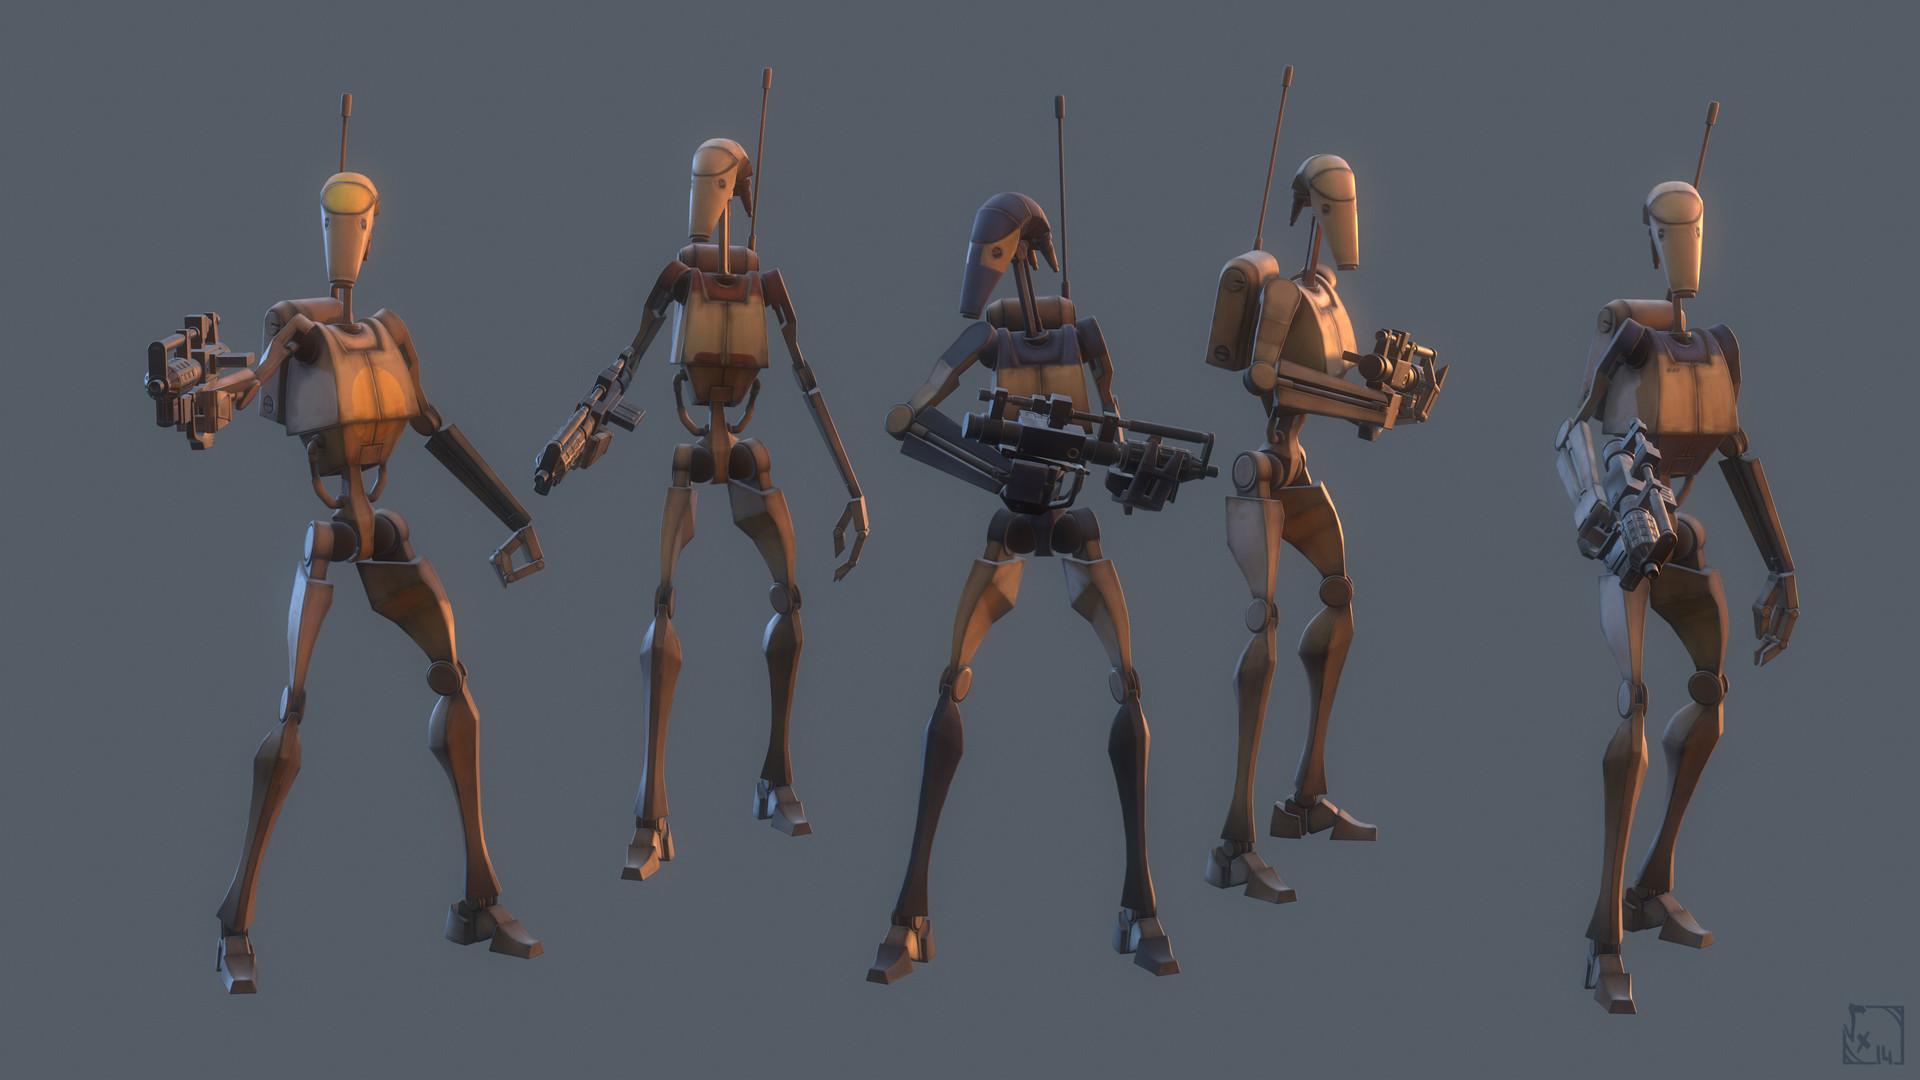 Thomas chaumel cha battle droids b1